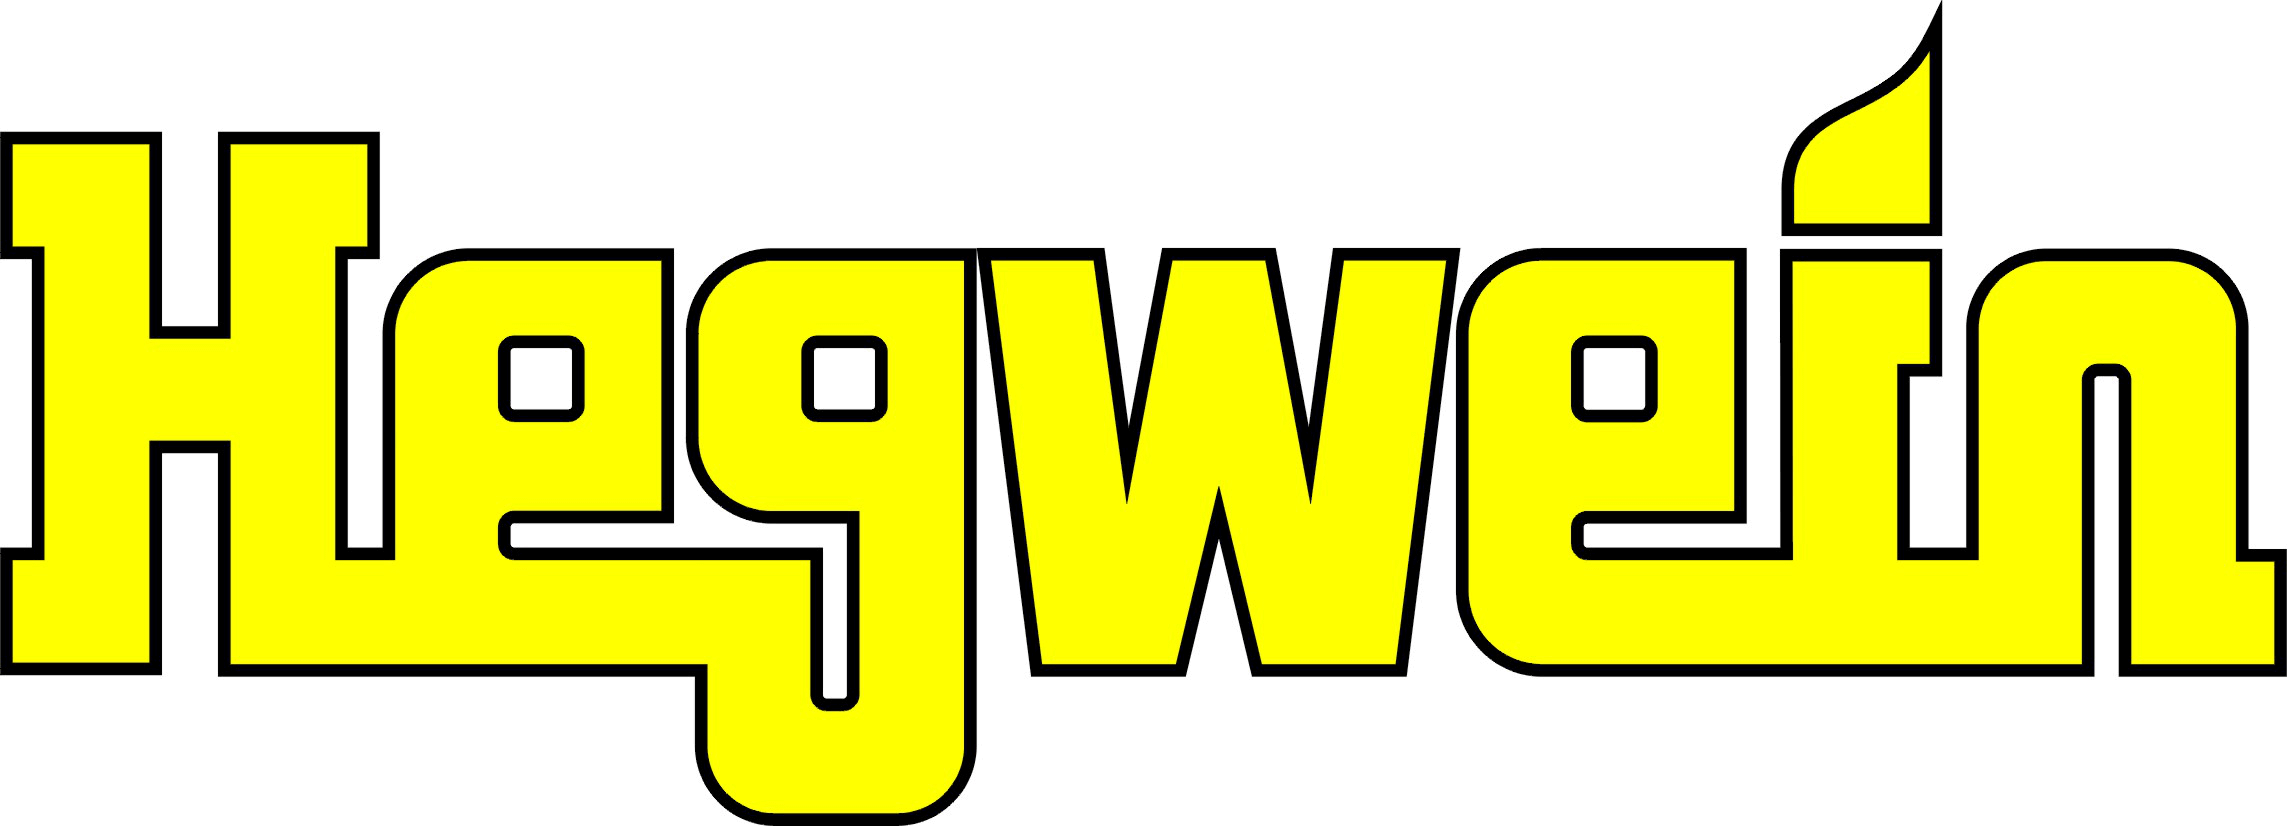 Hegwein